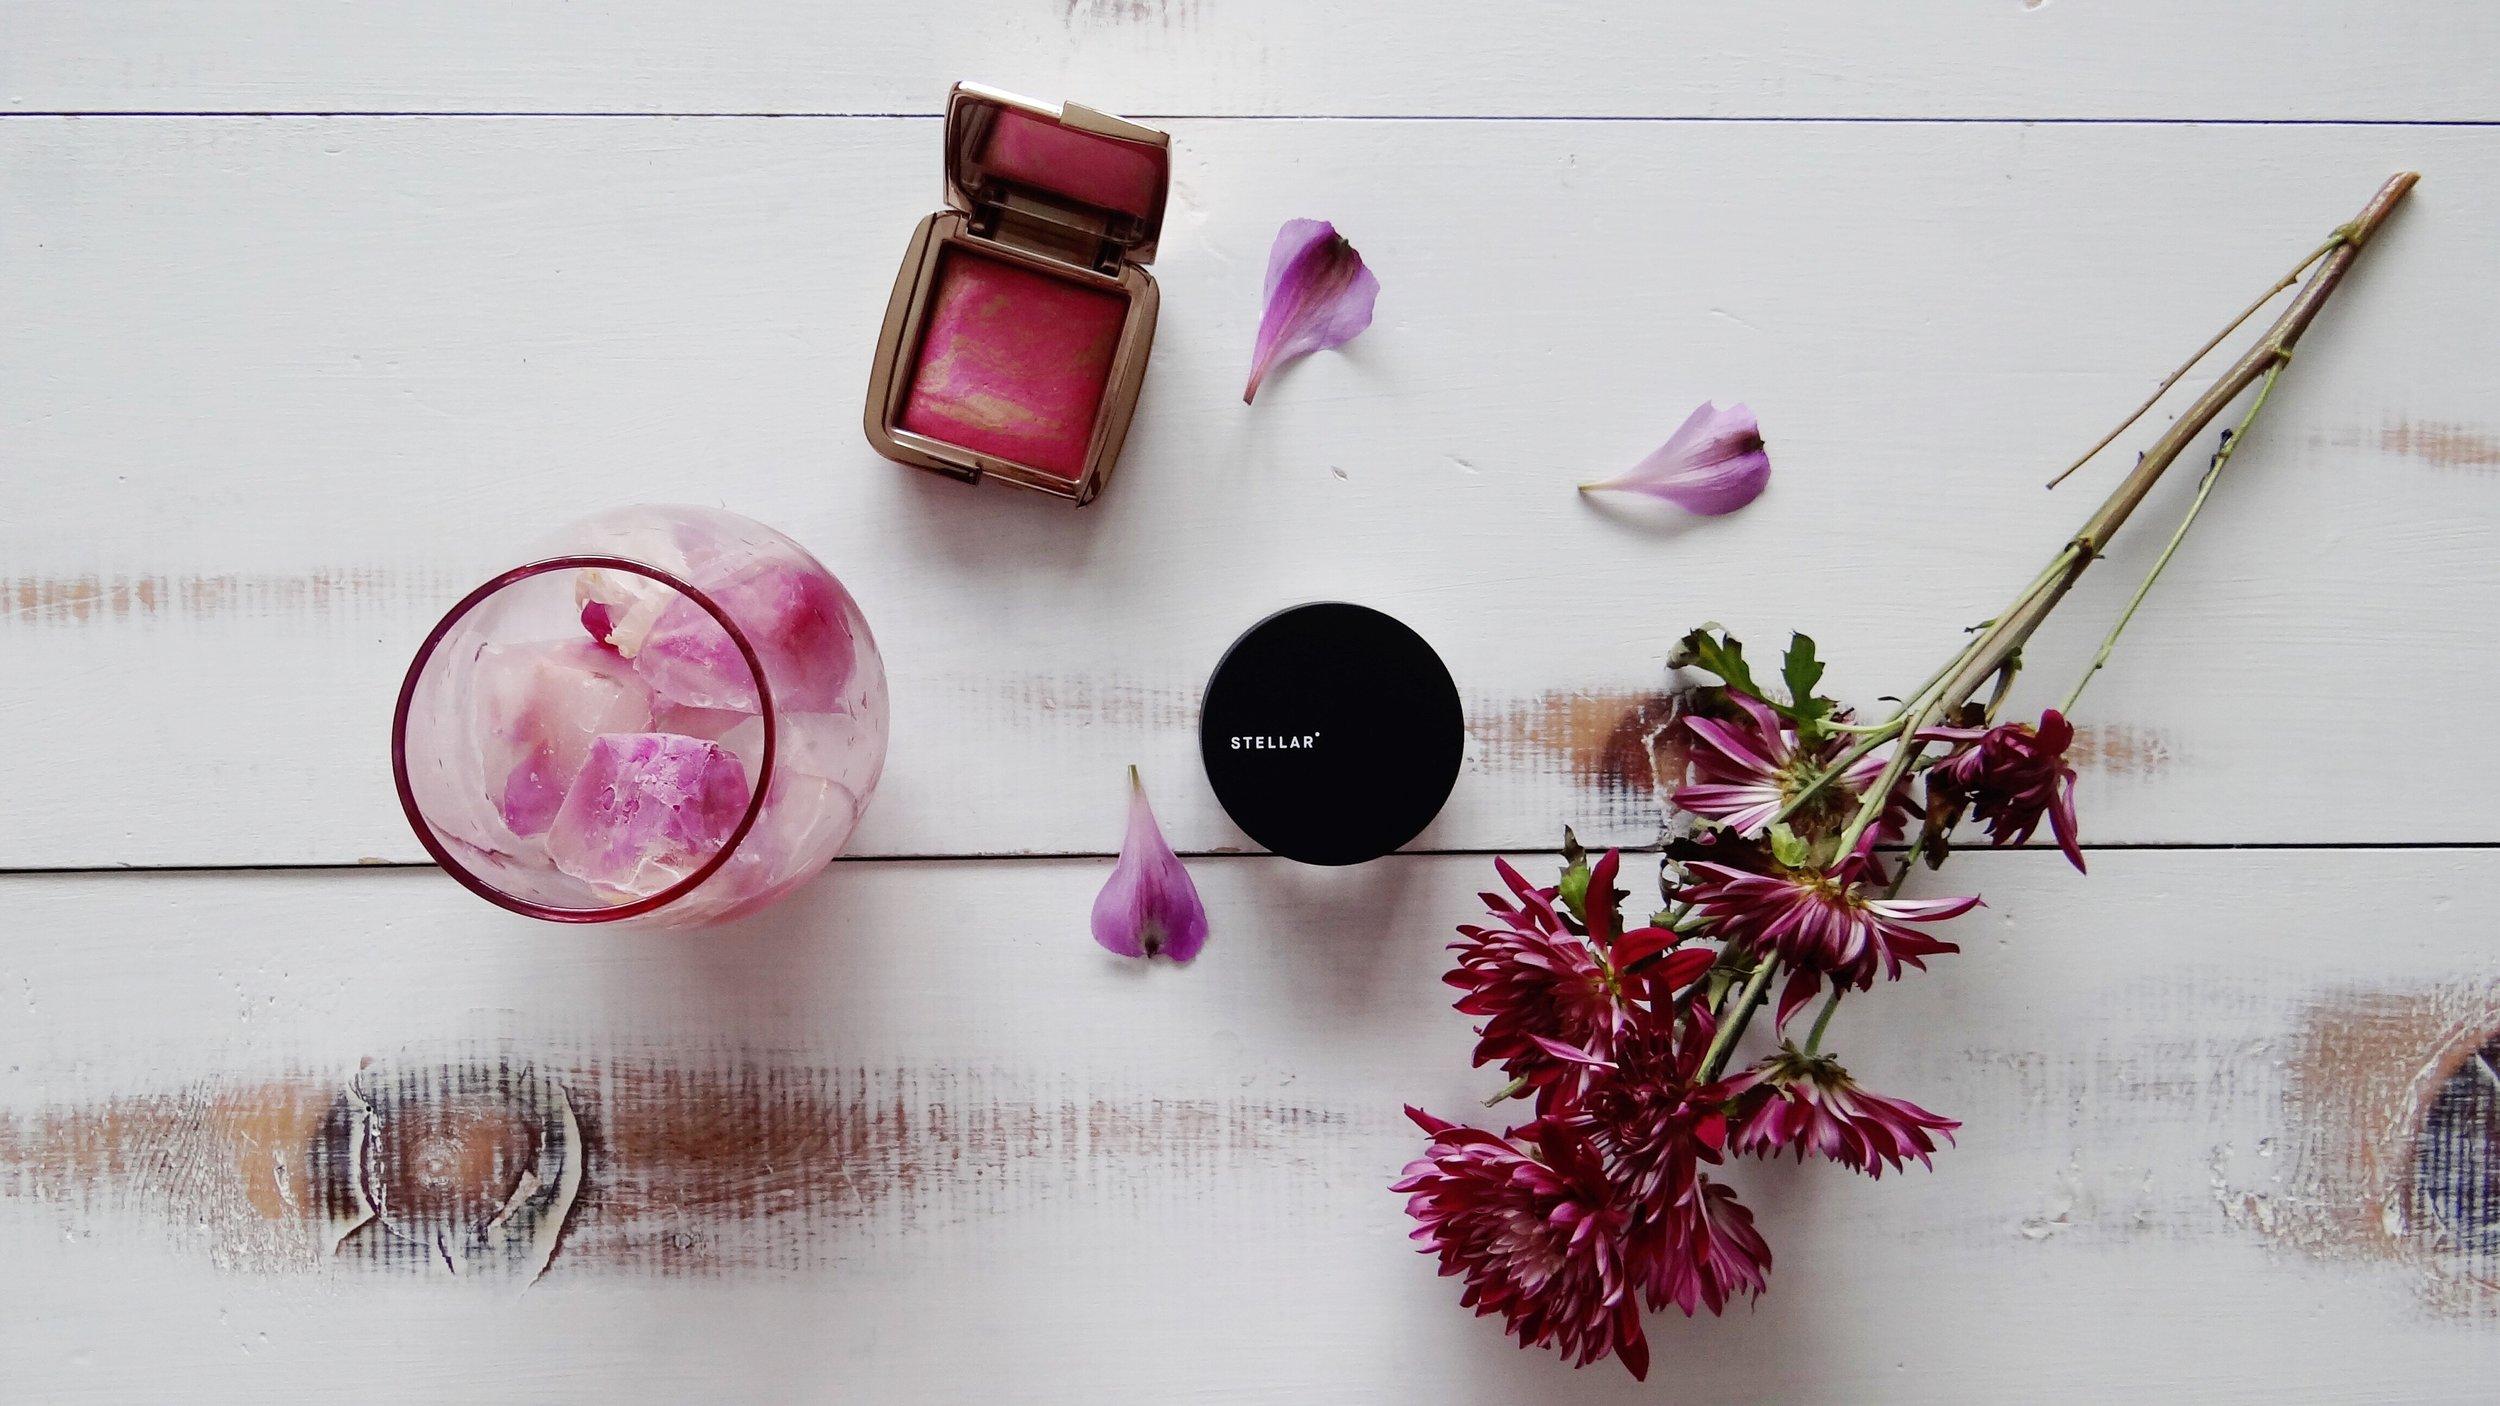 Minimalist & Cruelty-Free Makeup Routine - Artistry by Jacquie, Ottawa Makeup Artist (Stellar Cosmetics & Hourglass Cosmetics)